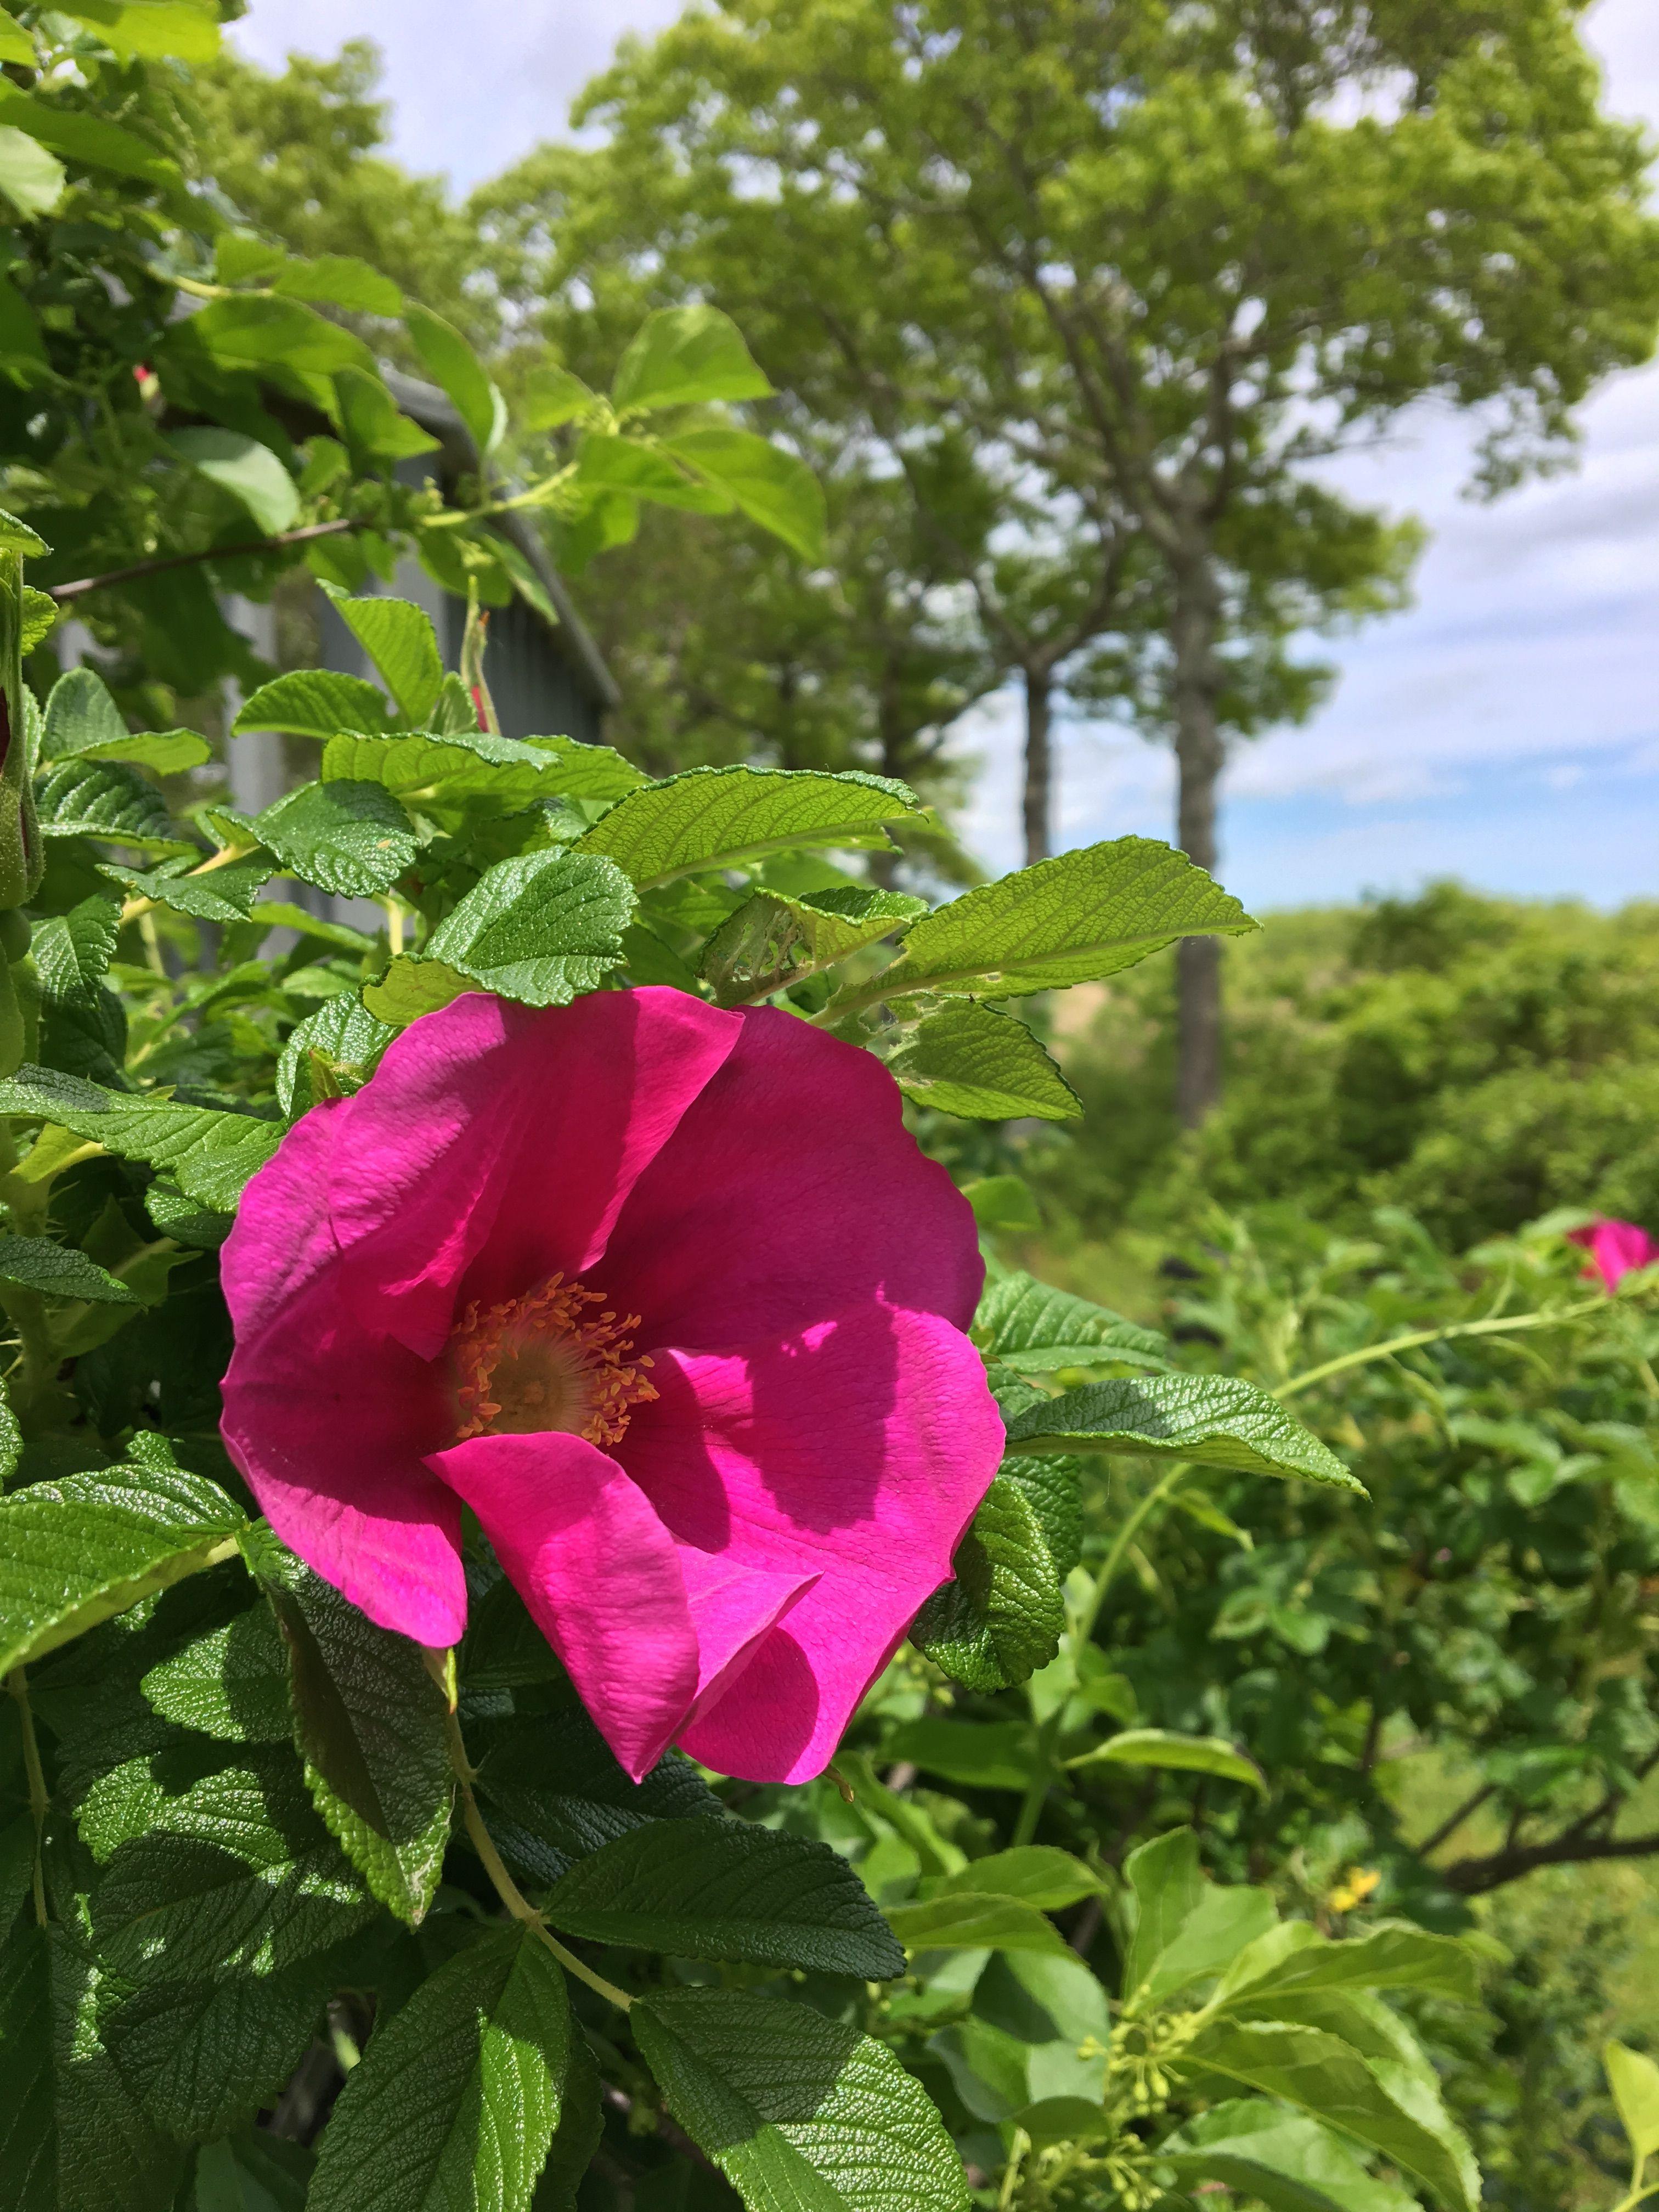 Rosa rugosa beach rose in bloom the house on the marsh pinterest